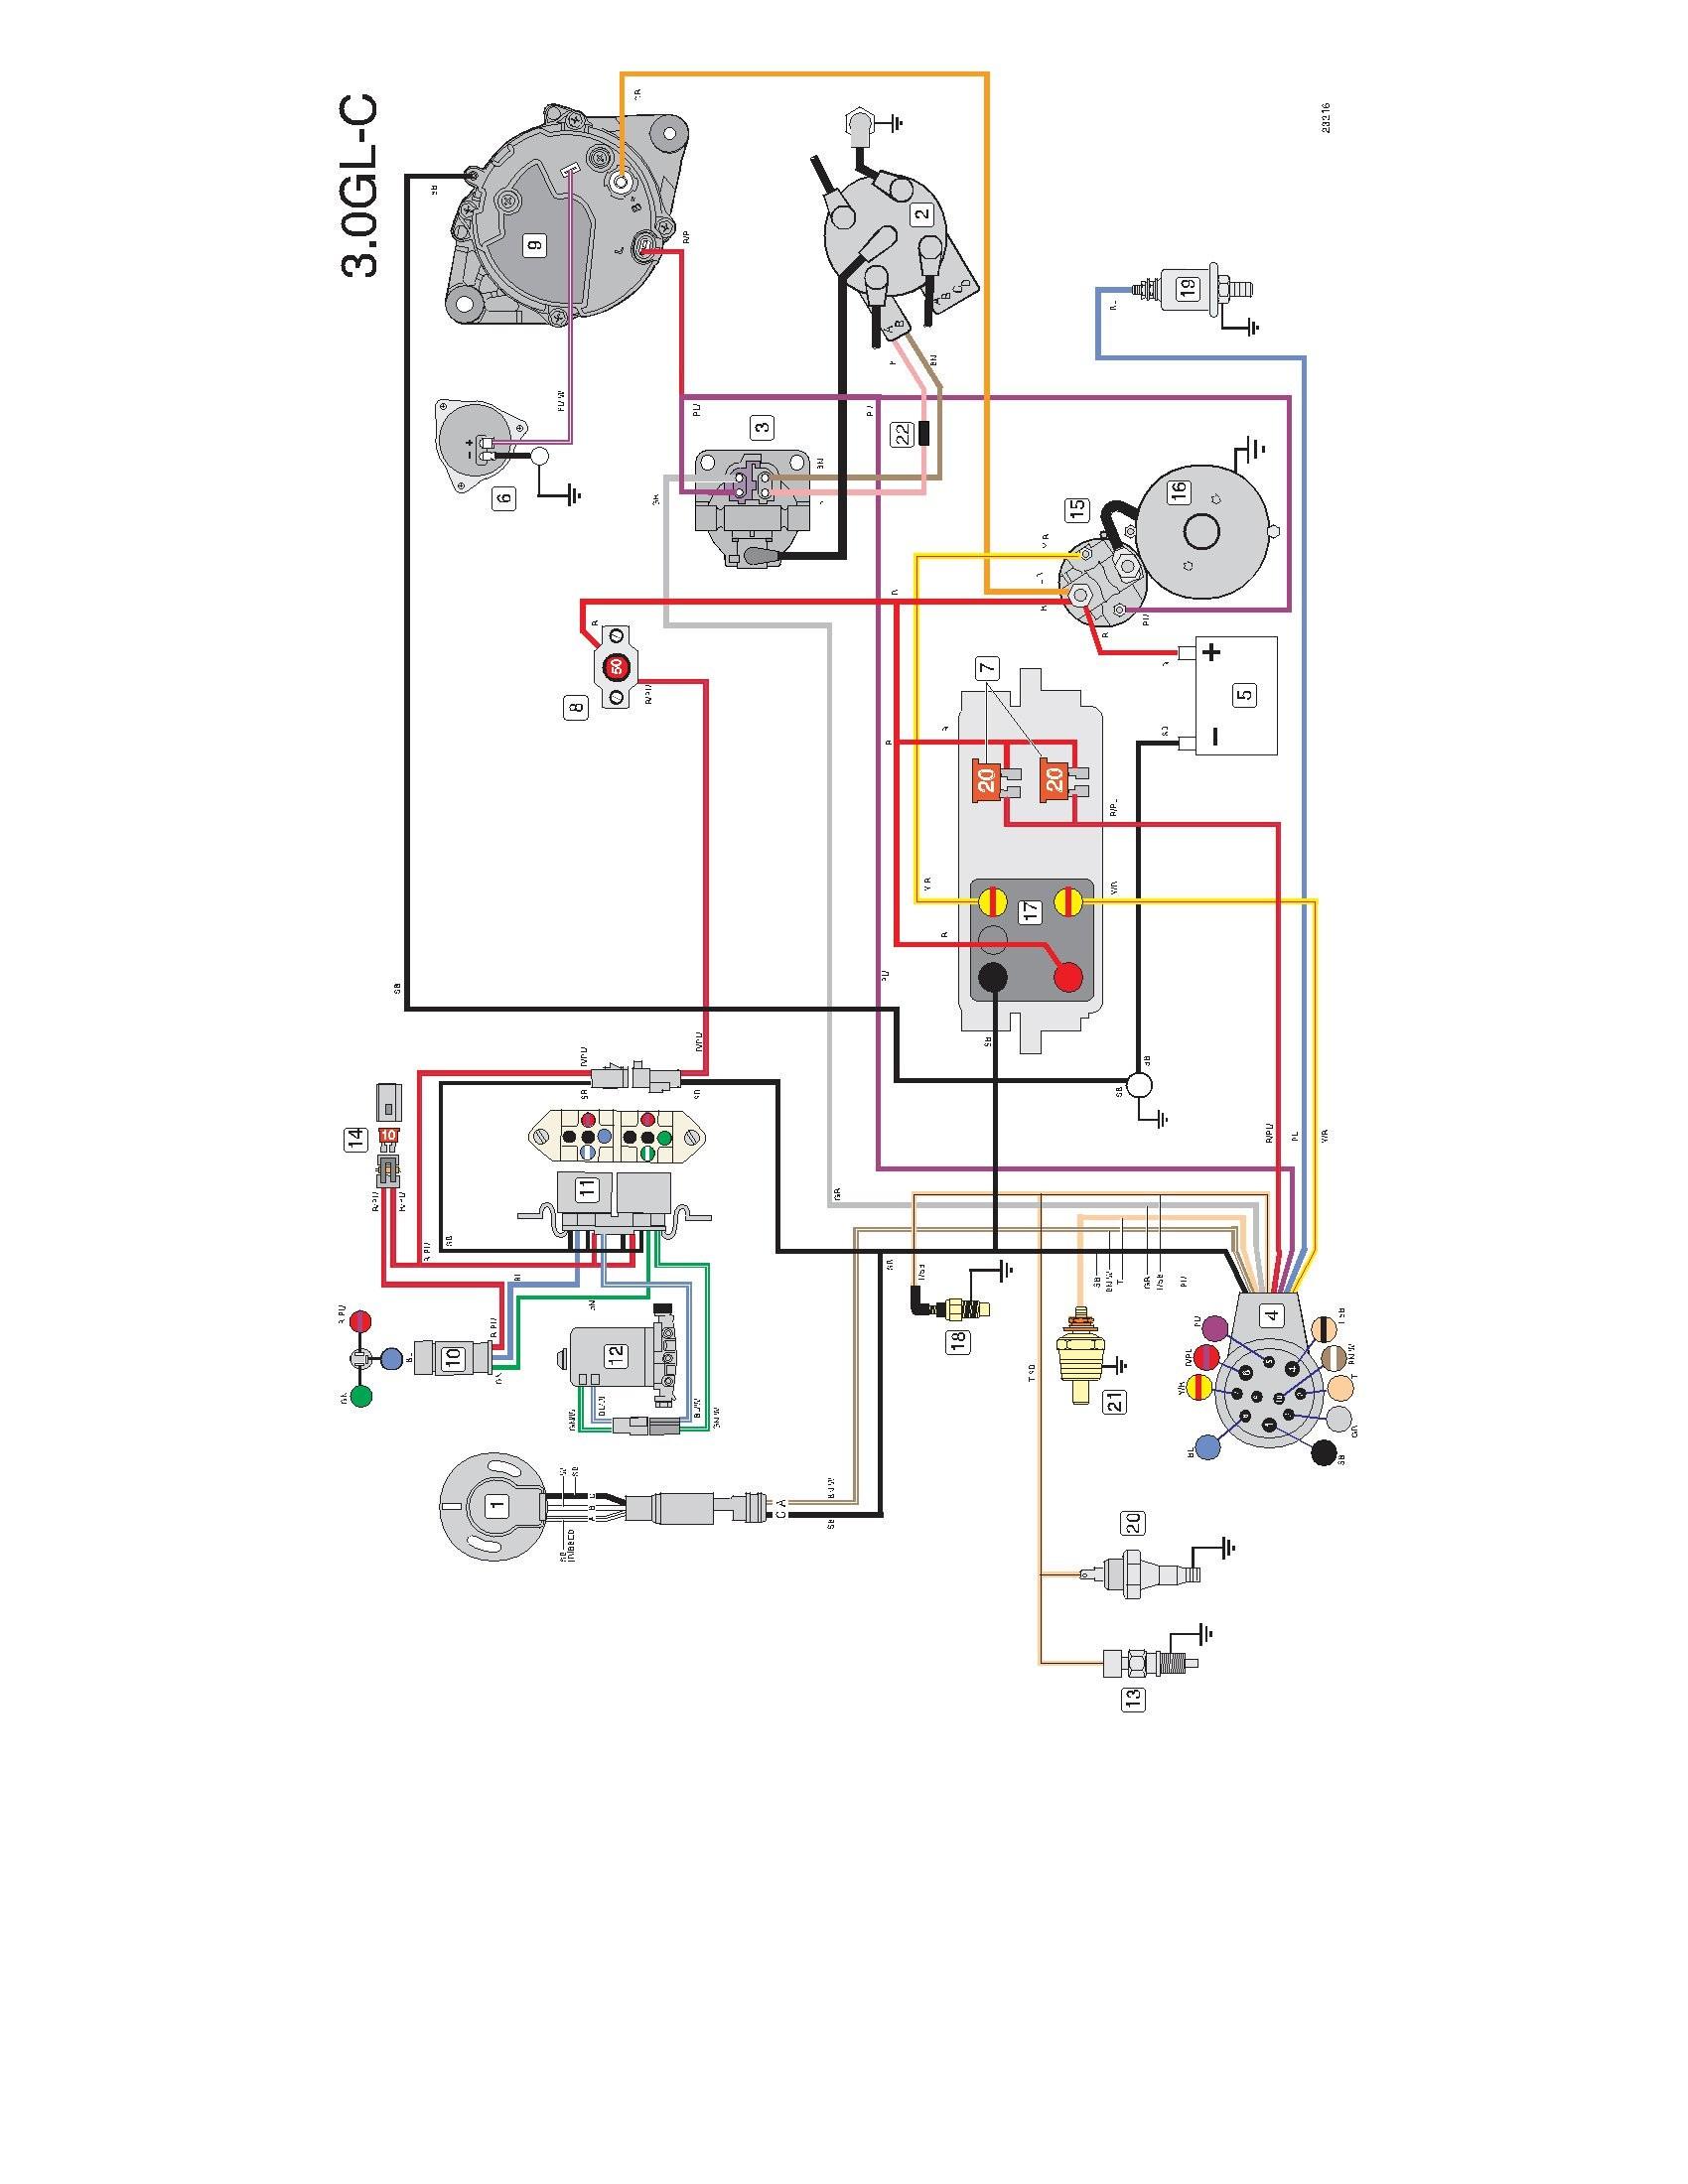 Volvo Penta 5 7 Mpi Marine Wiring Diagram